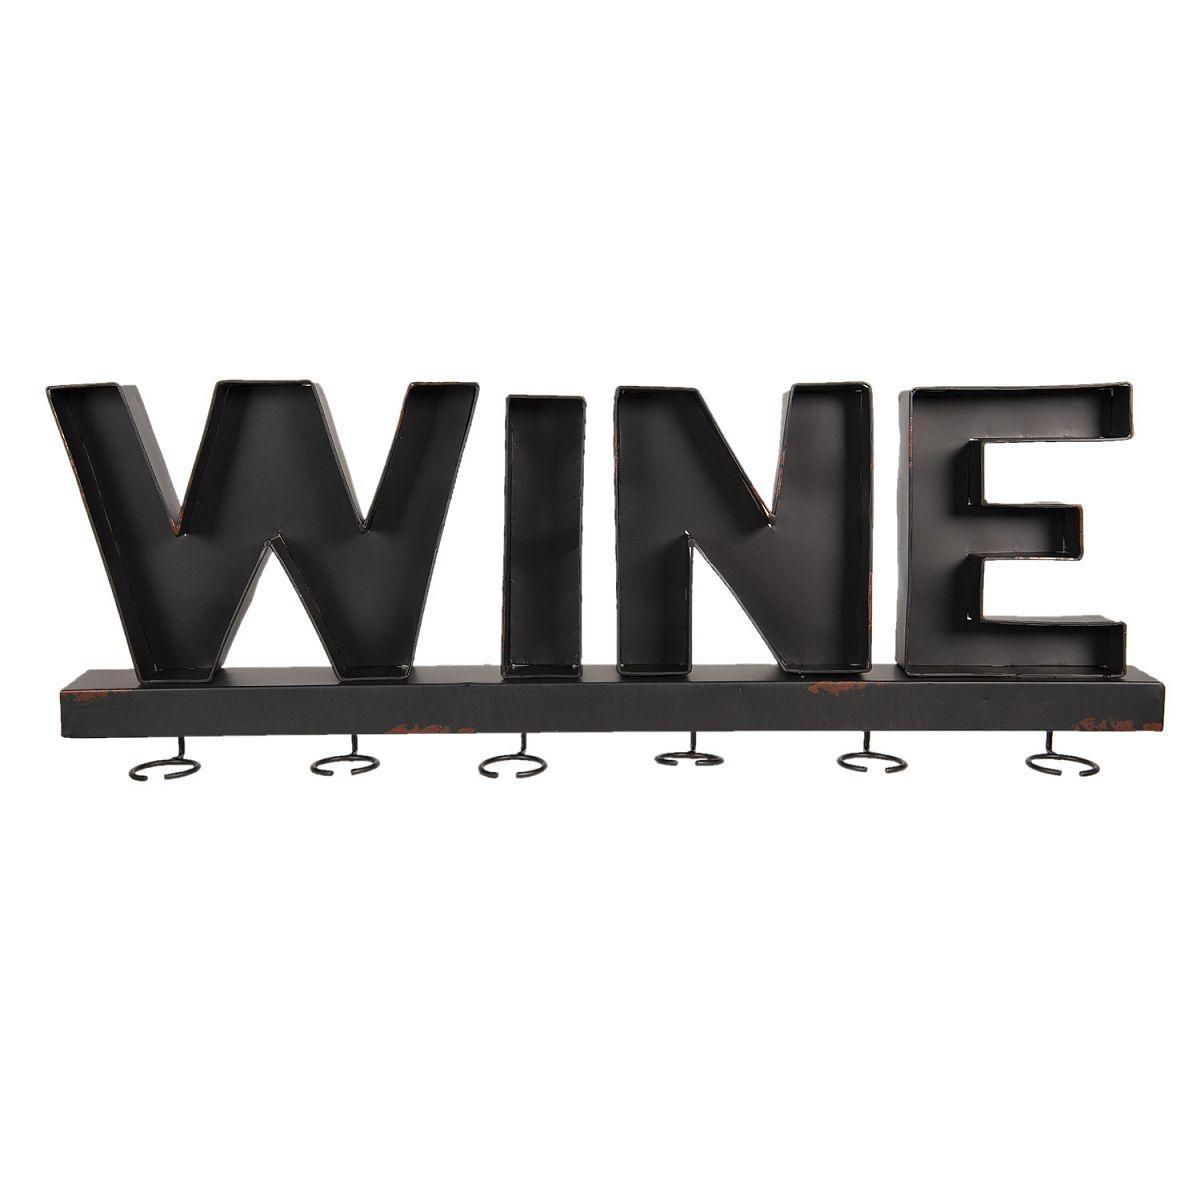 Nástěnný držák na skleničky na víno